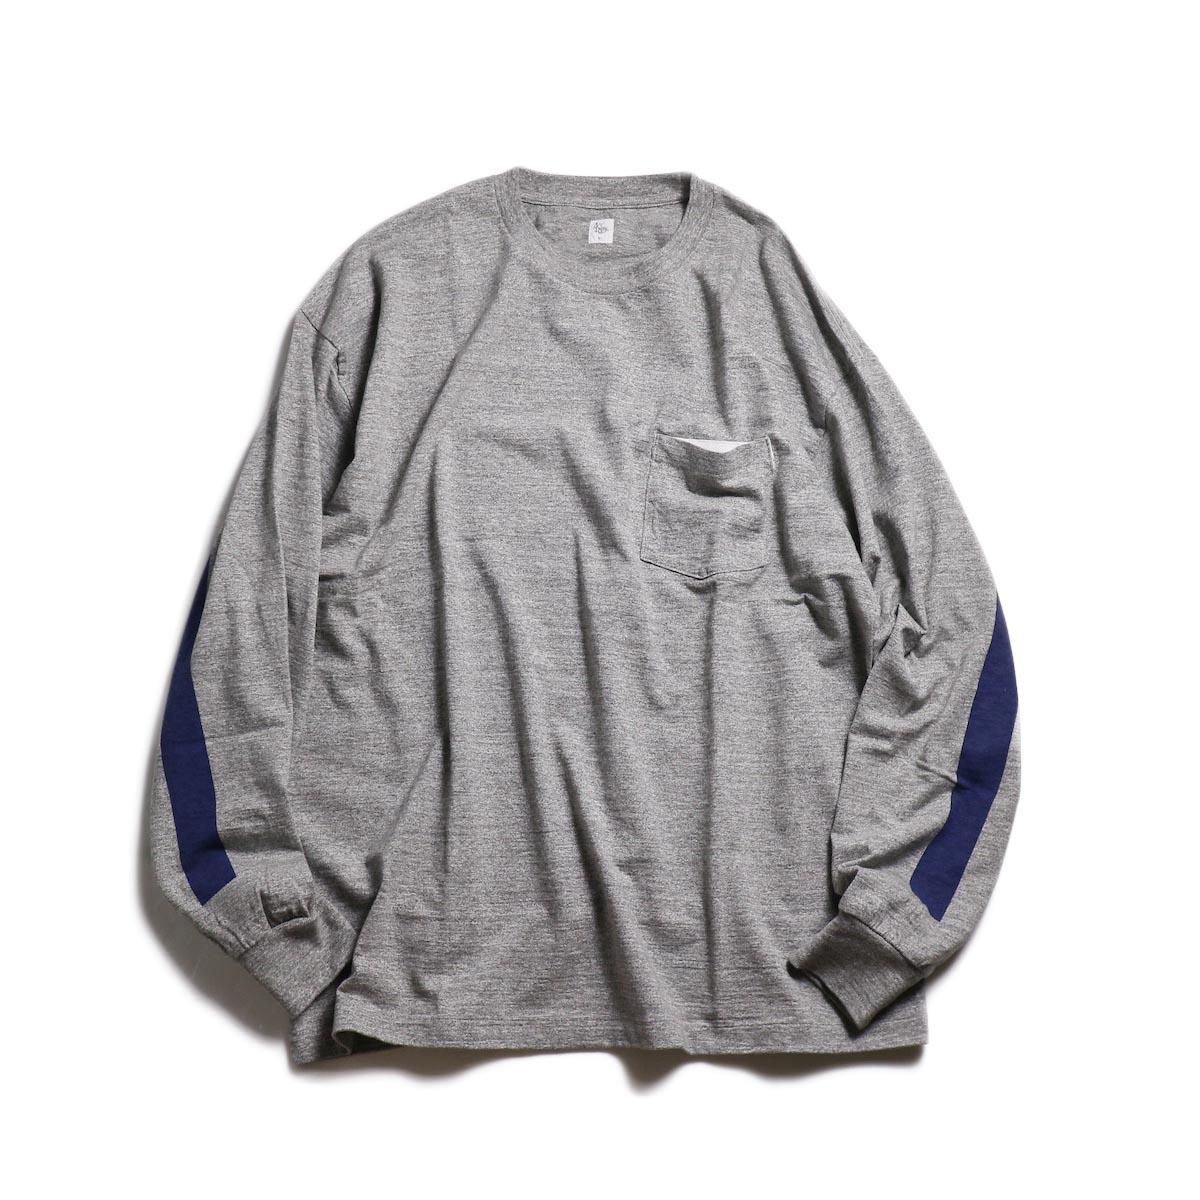 Kaptain Sunshine / West Coast L/S Tee -Feather Grey × Navy Line